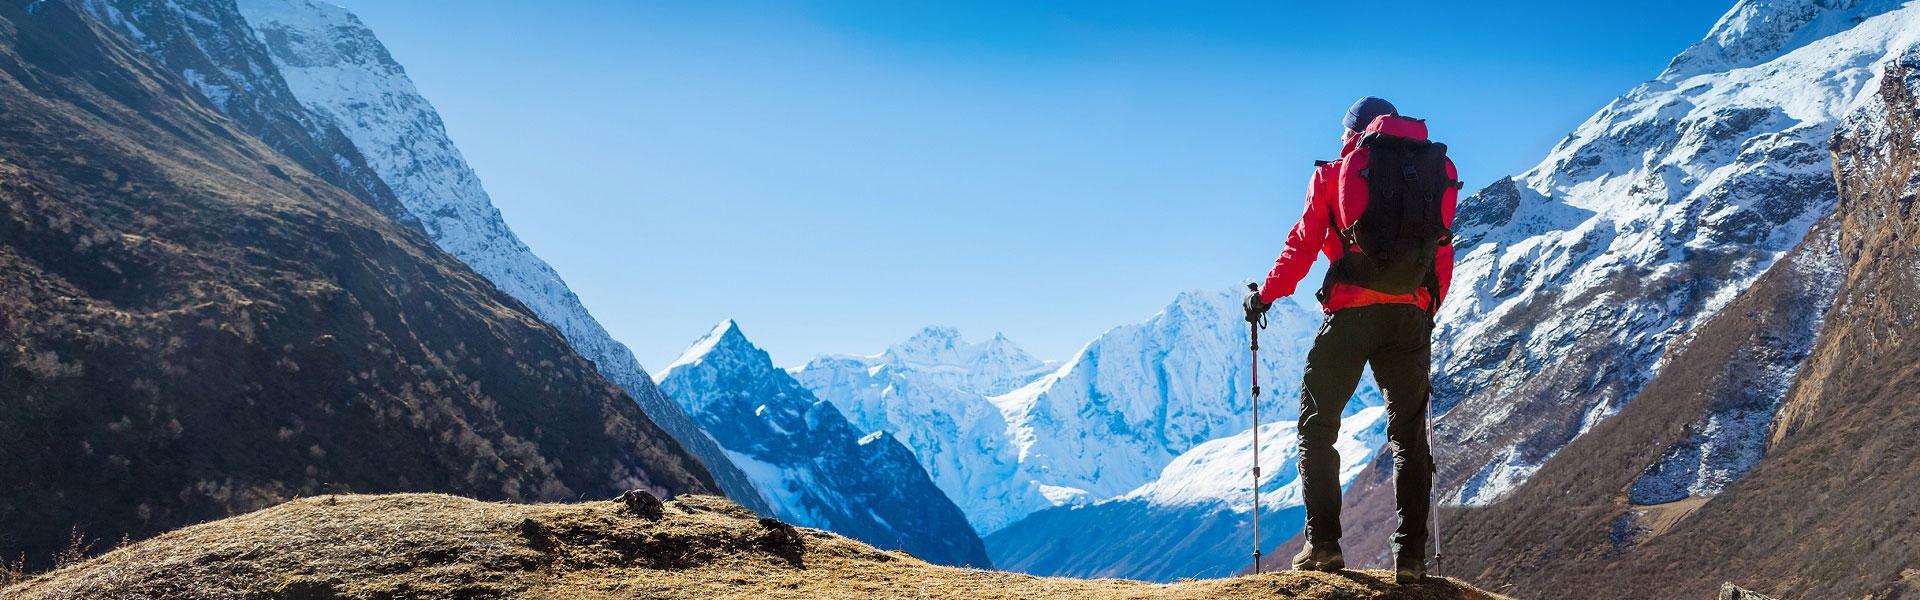 Hiking the Himalayas